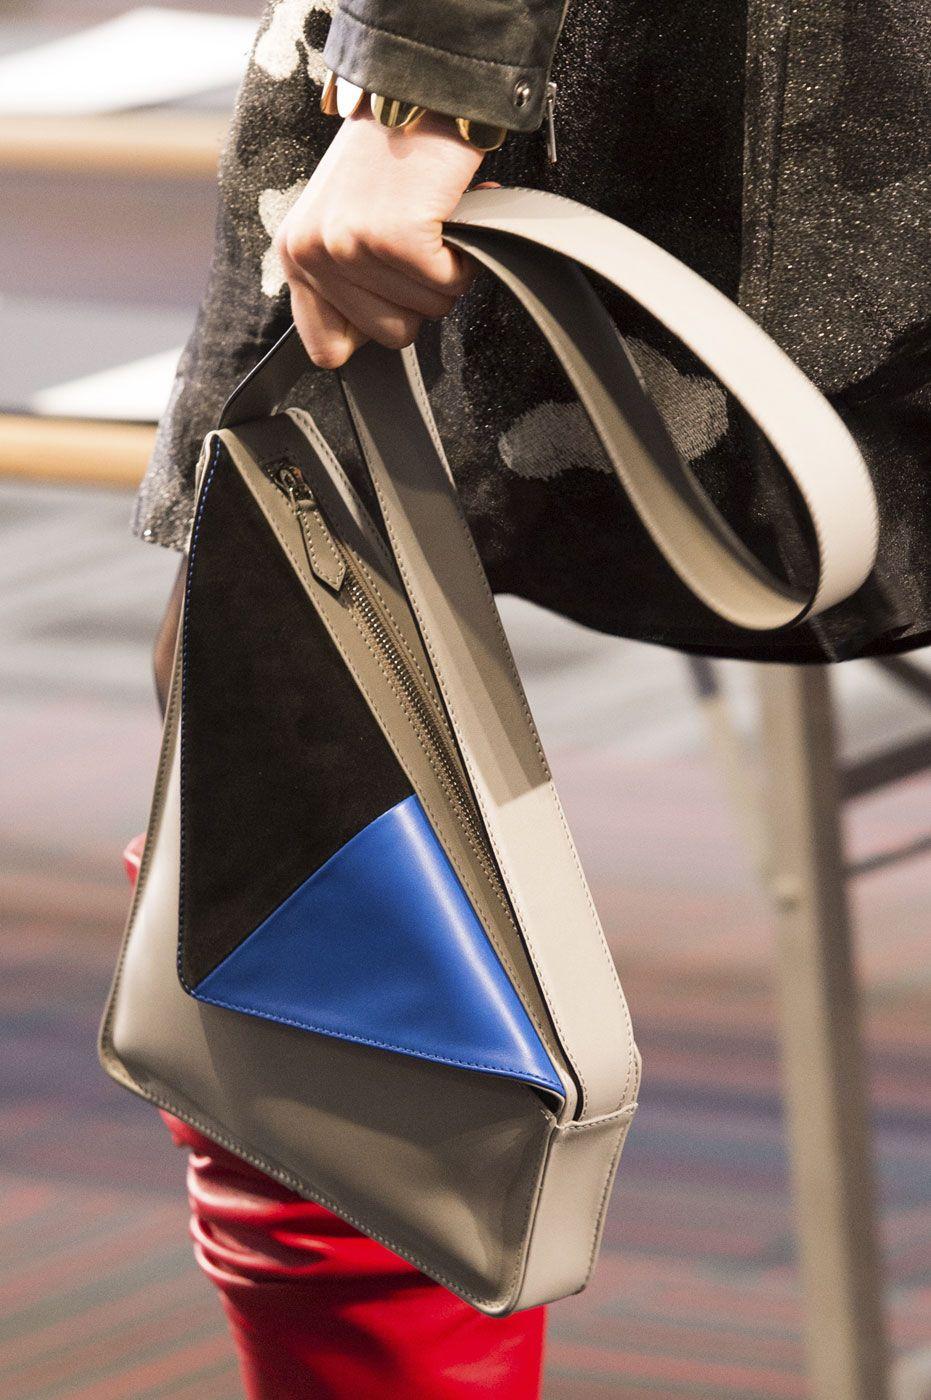 Cosmopolitan May 2014 L.A.M.B. Cloe II Handbag Sweepstakes Official Rules forecast